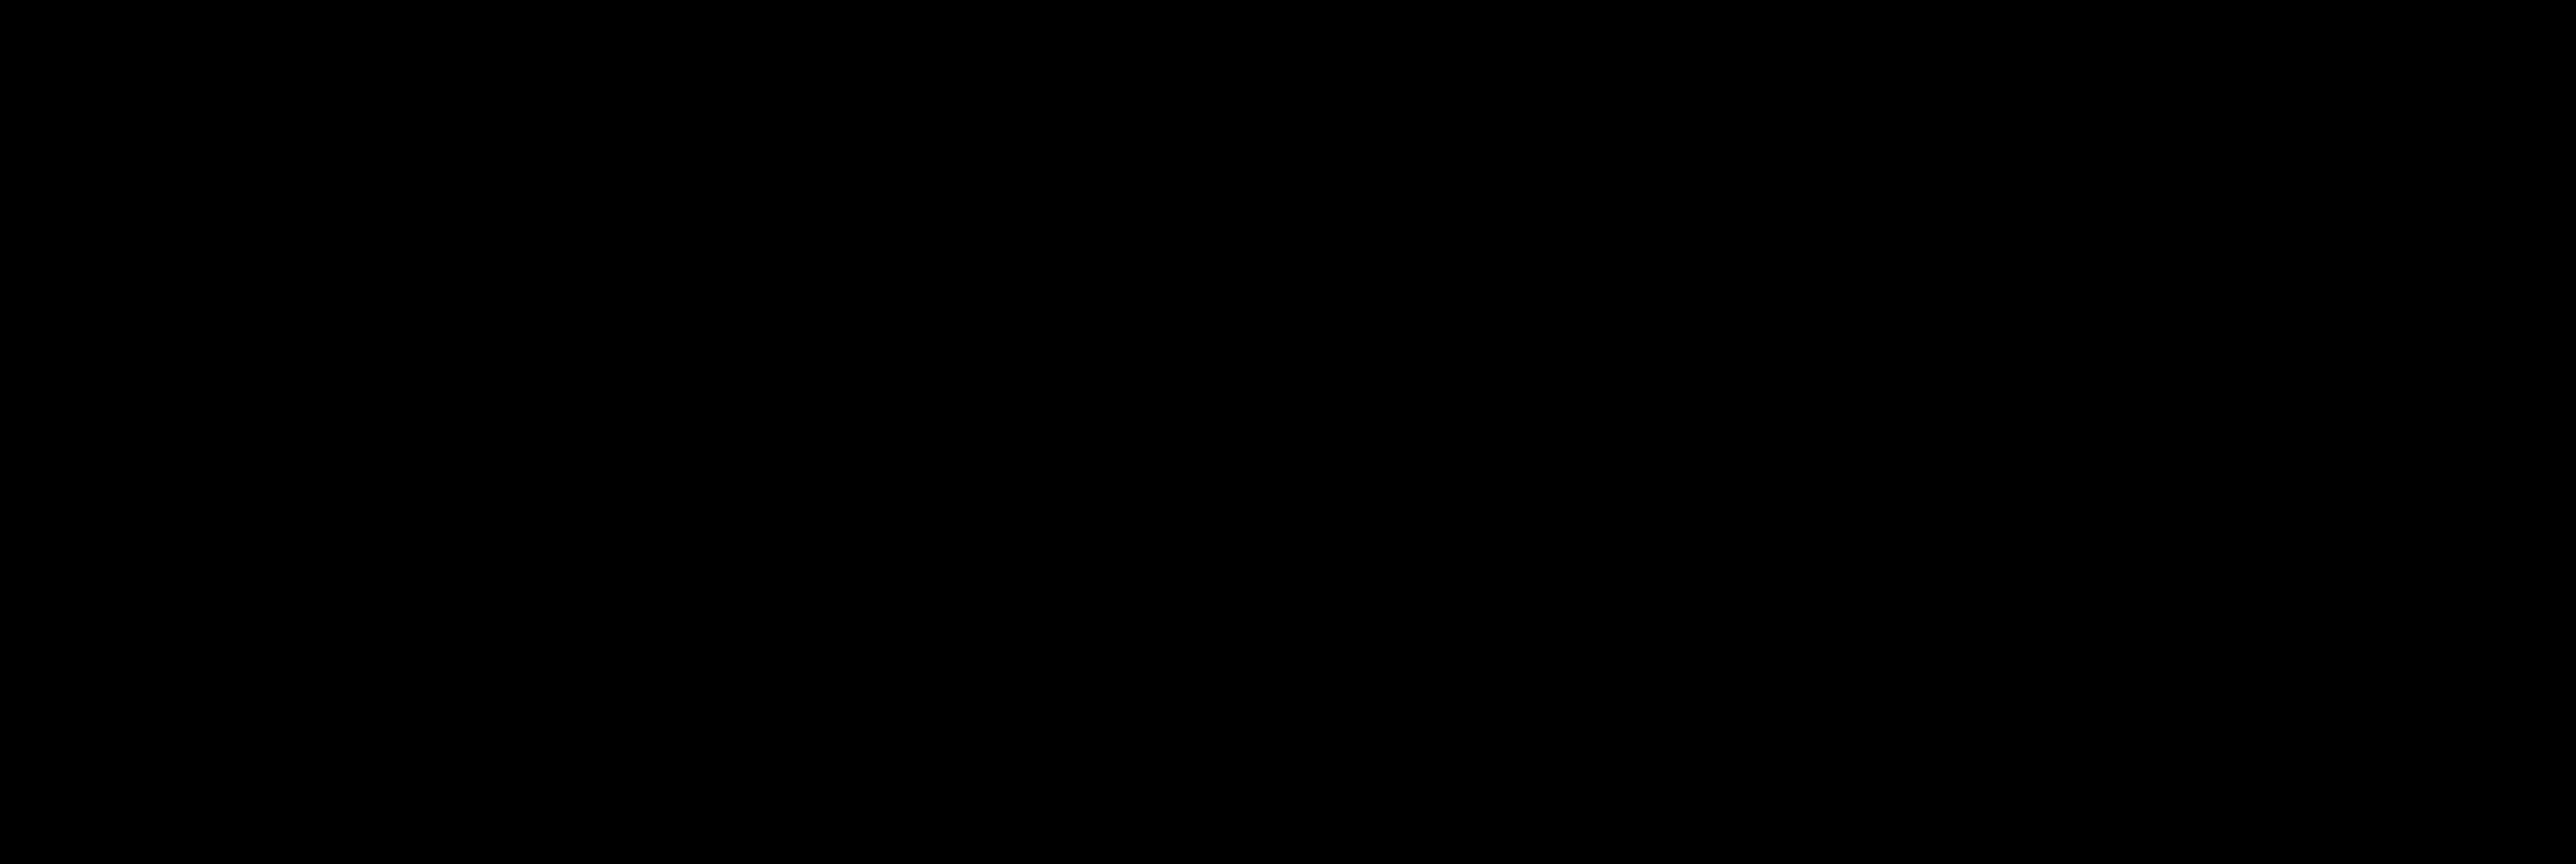 9 Crack Overlay Background (PNG Transparent)   OnlyGFX.com